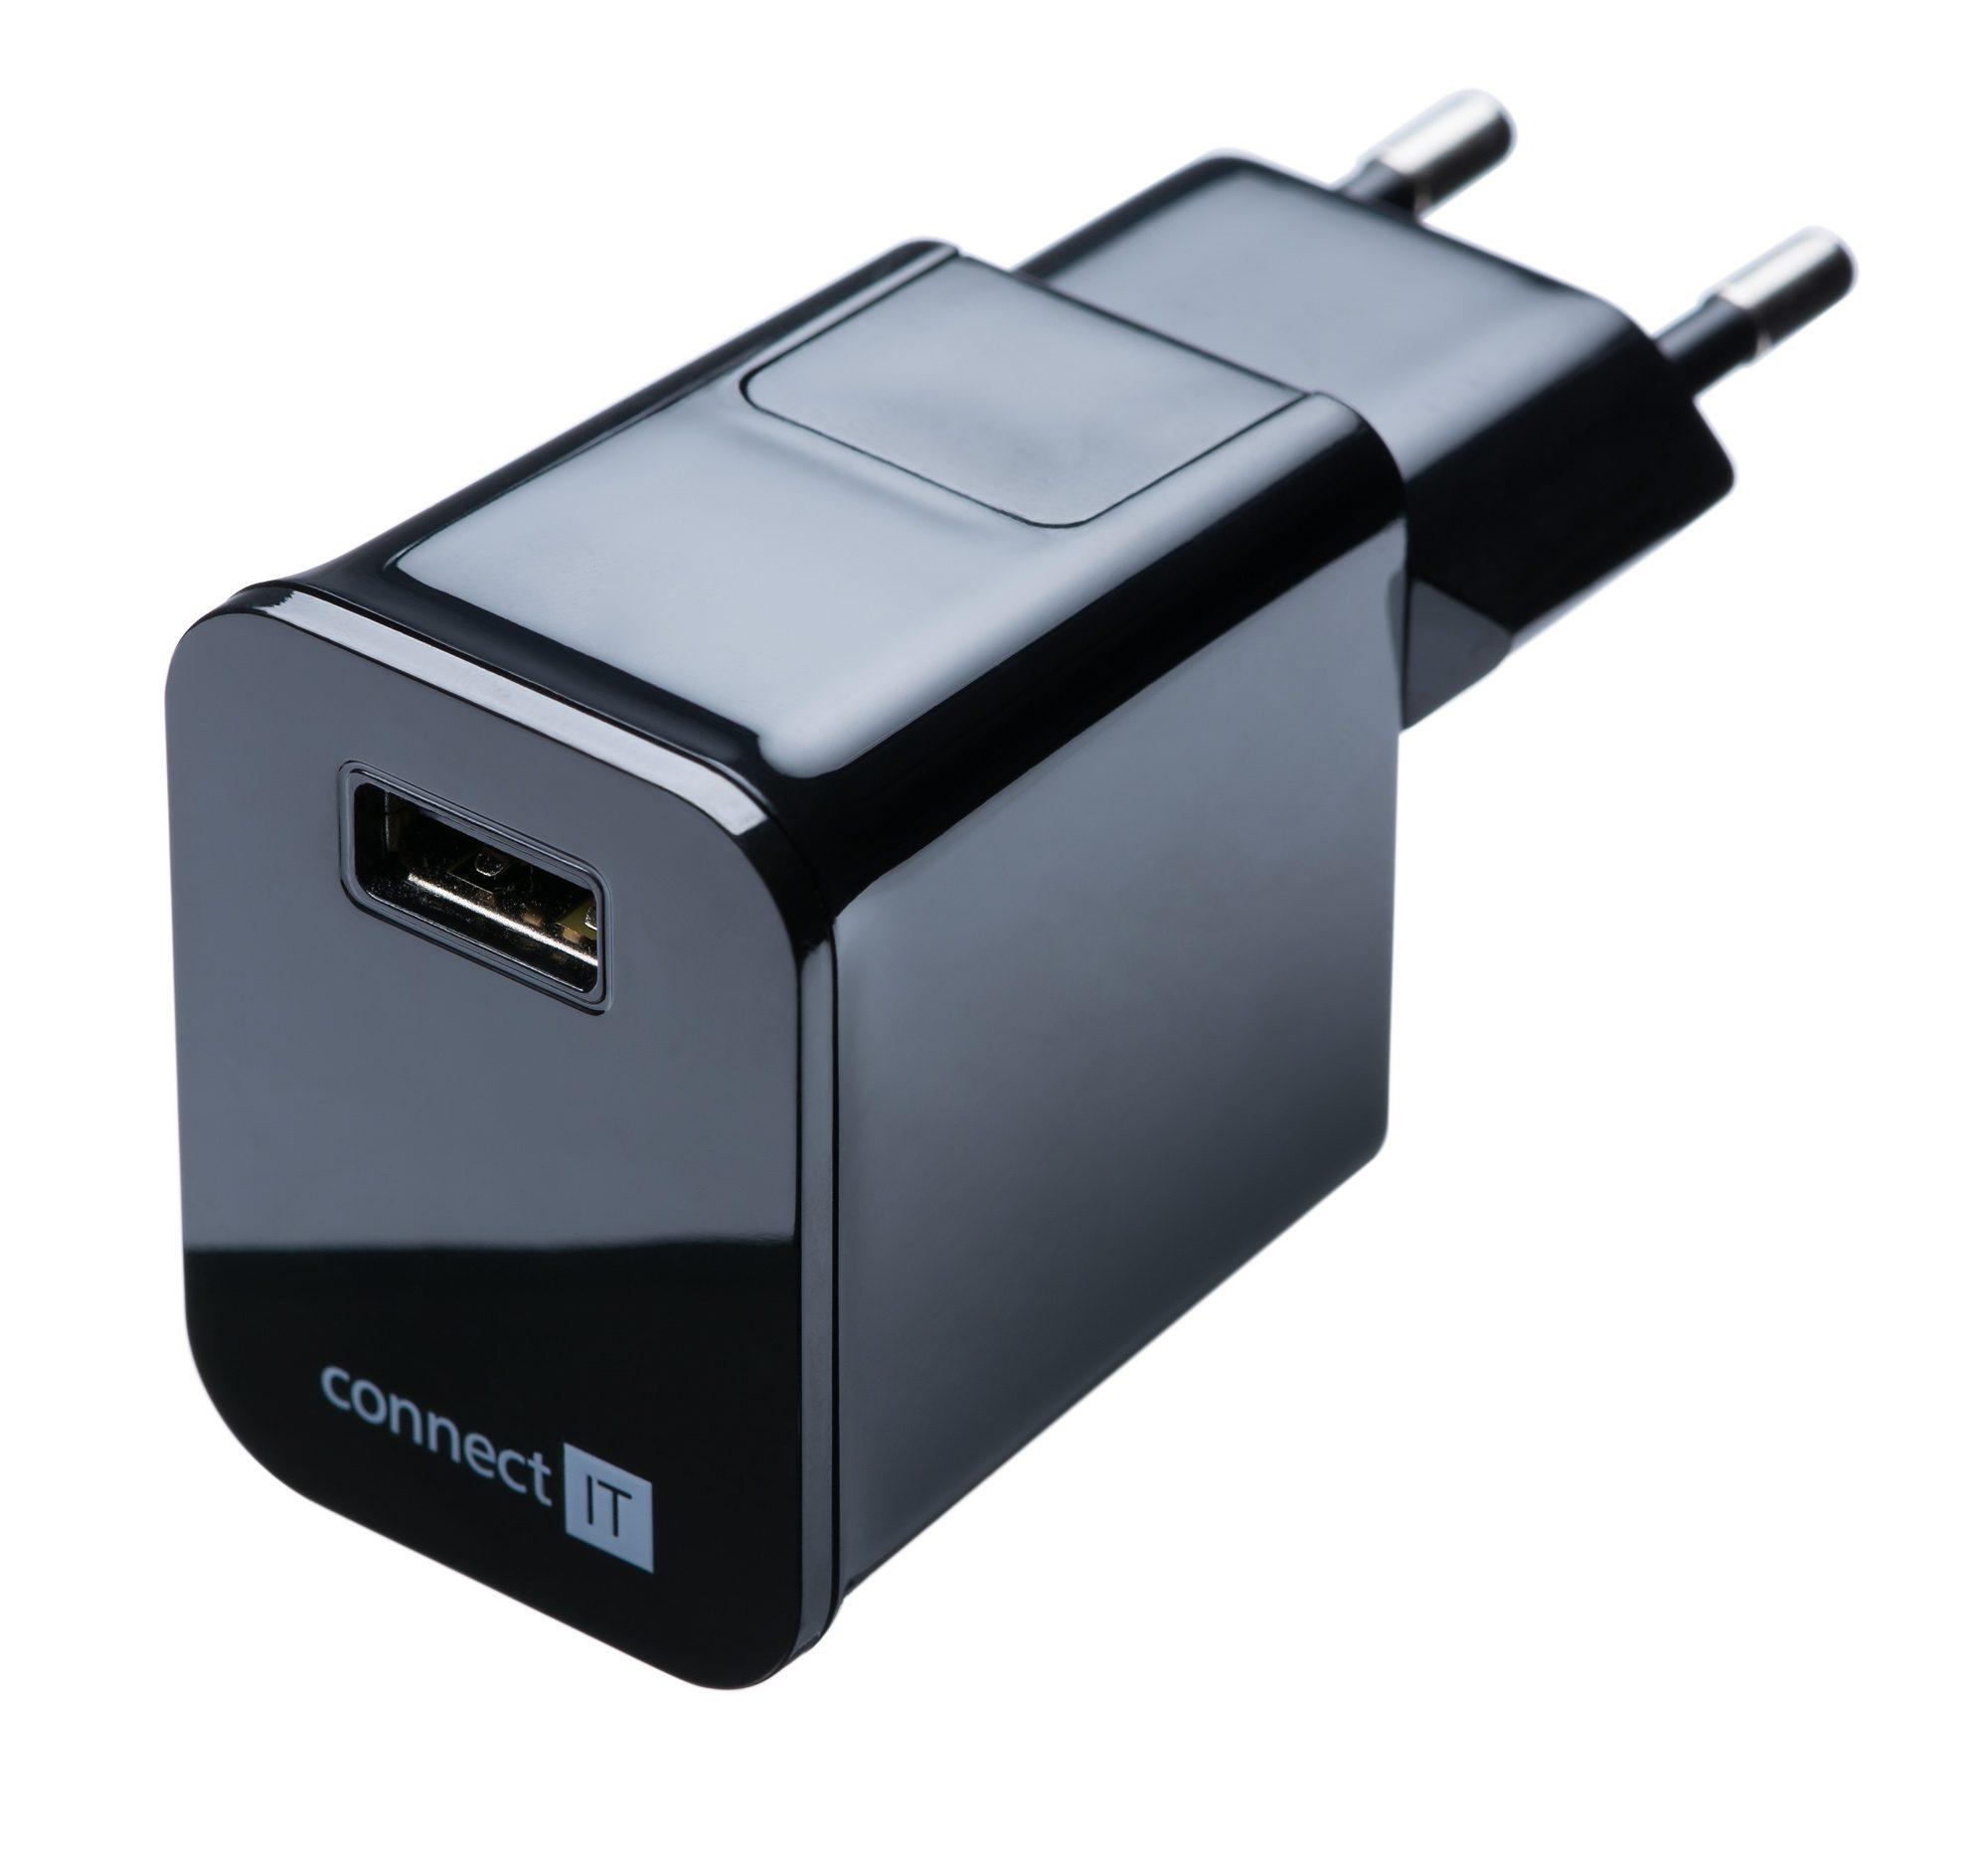 connect IT Ladegerät »IT USB Netzteil 2.1 A Schwarz«